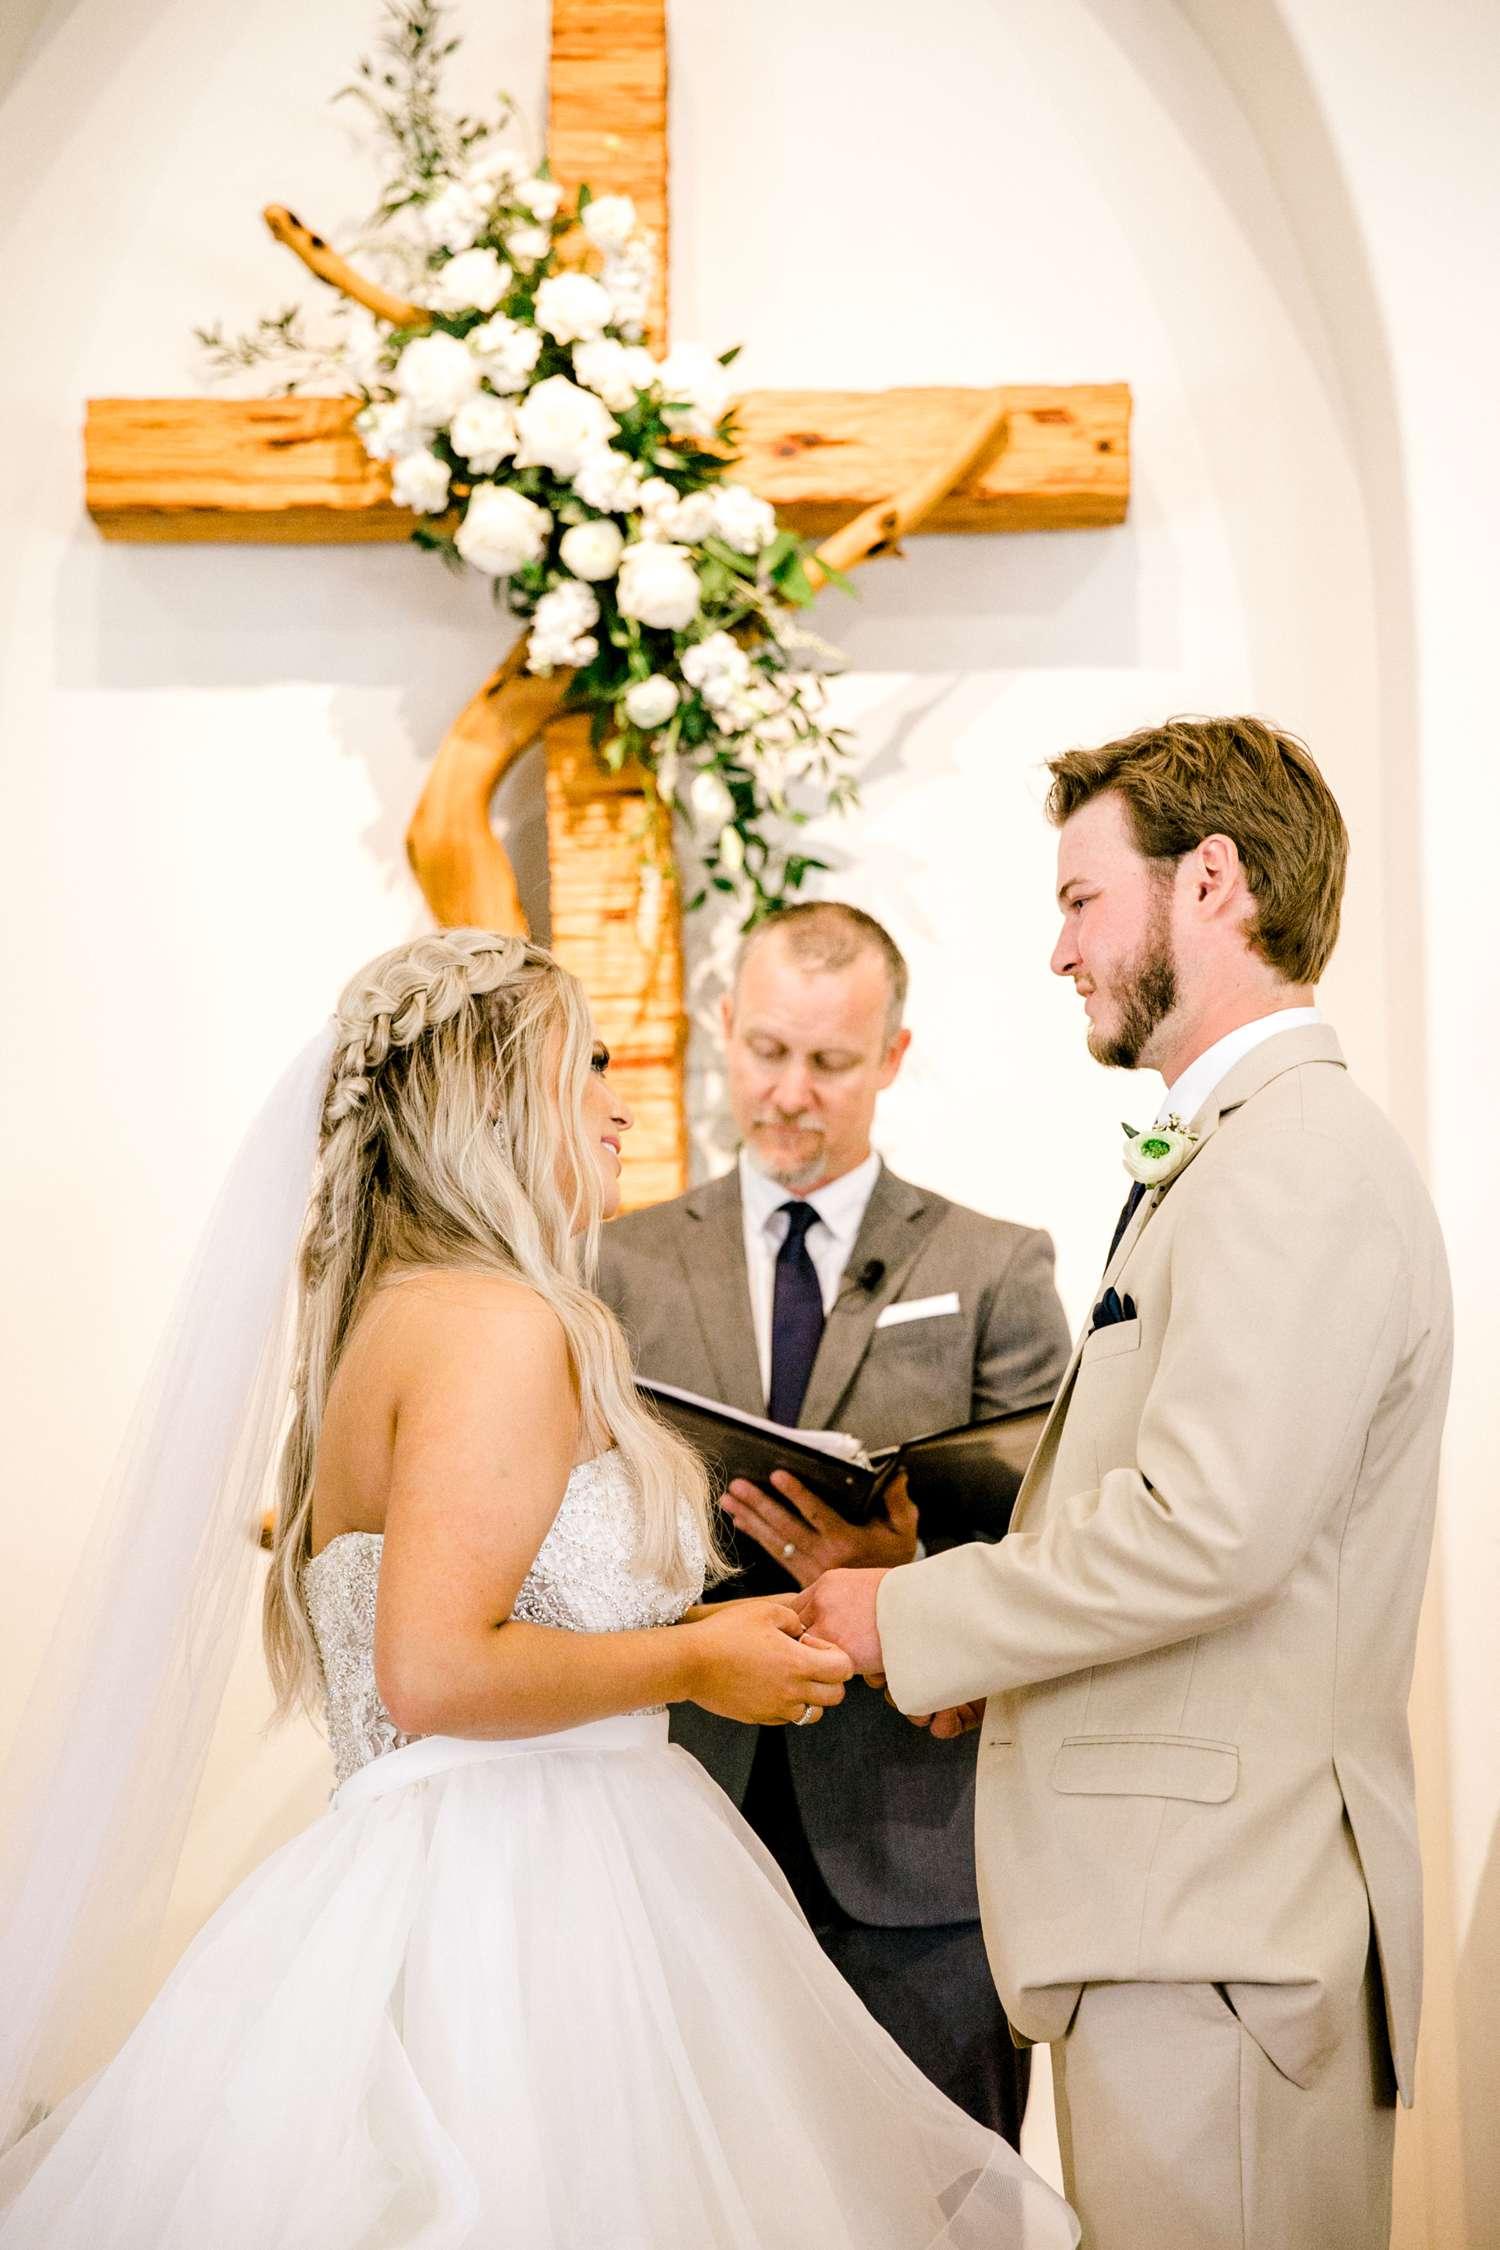 HAYLEE+JUSTIN+GREGORY+HERITAGE_HAUS_AUSTIN_TEXAS_WEDDING_0082.jpg